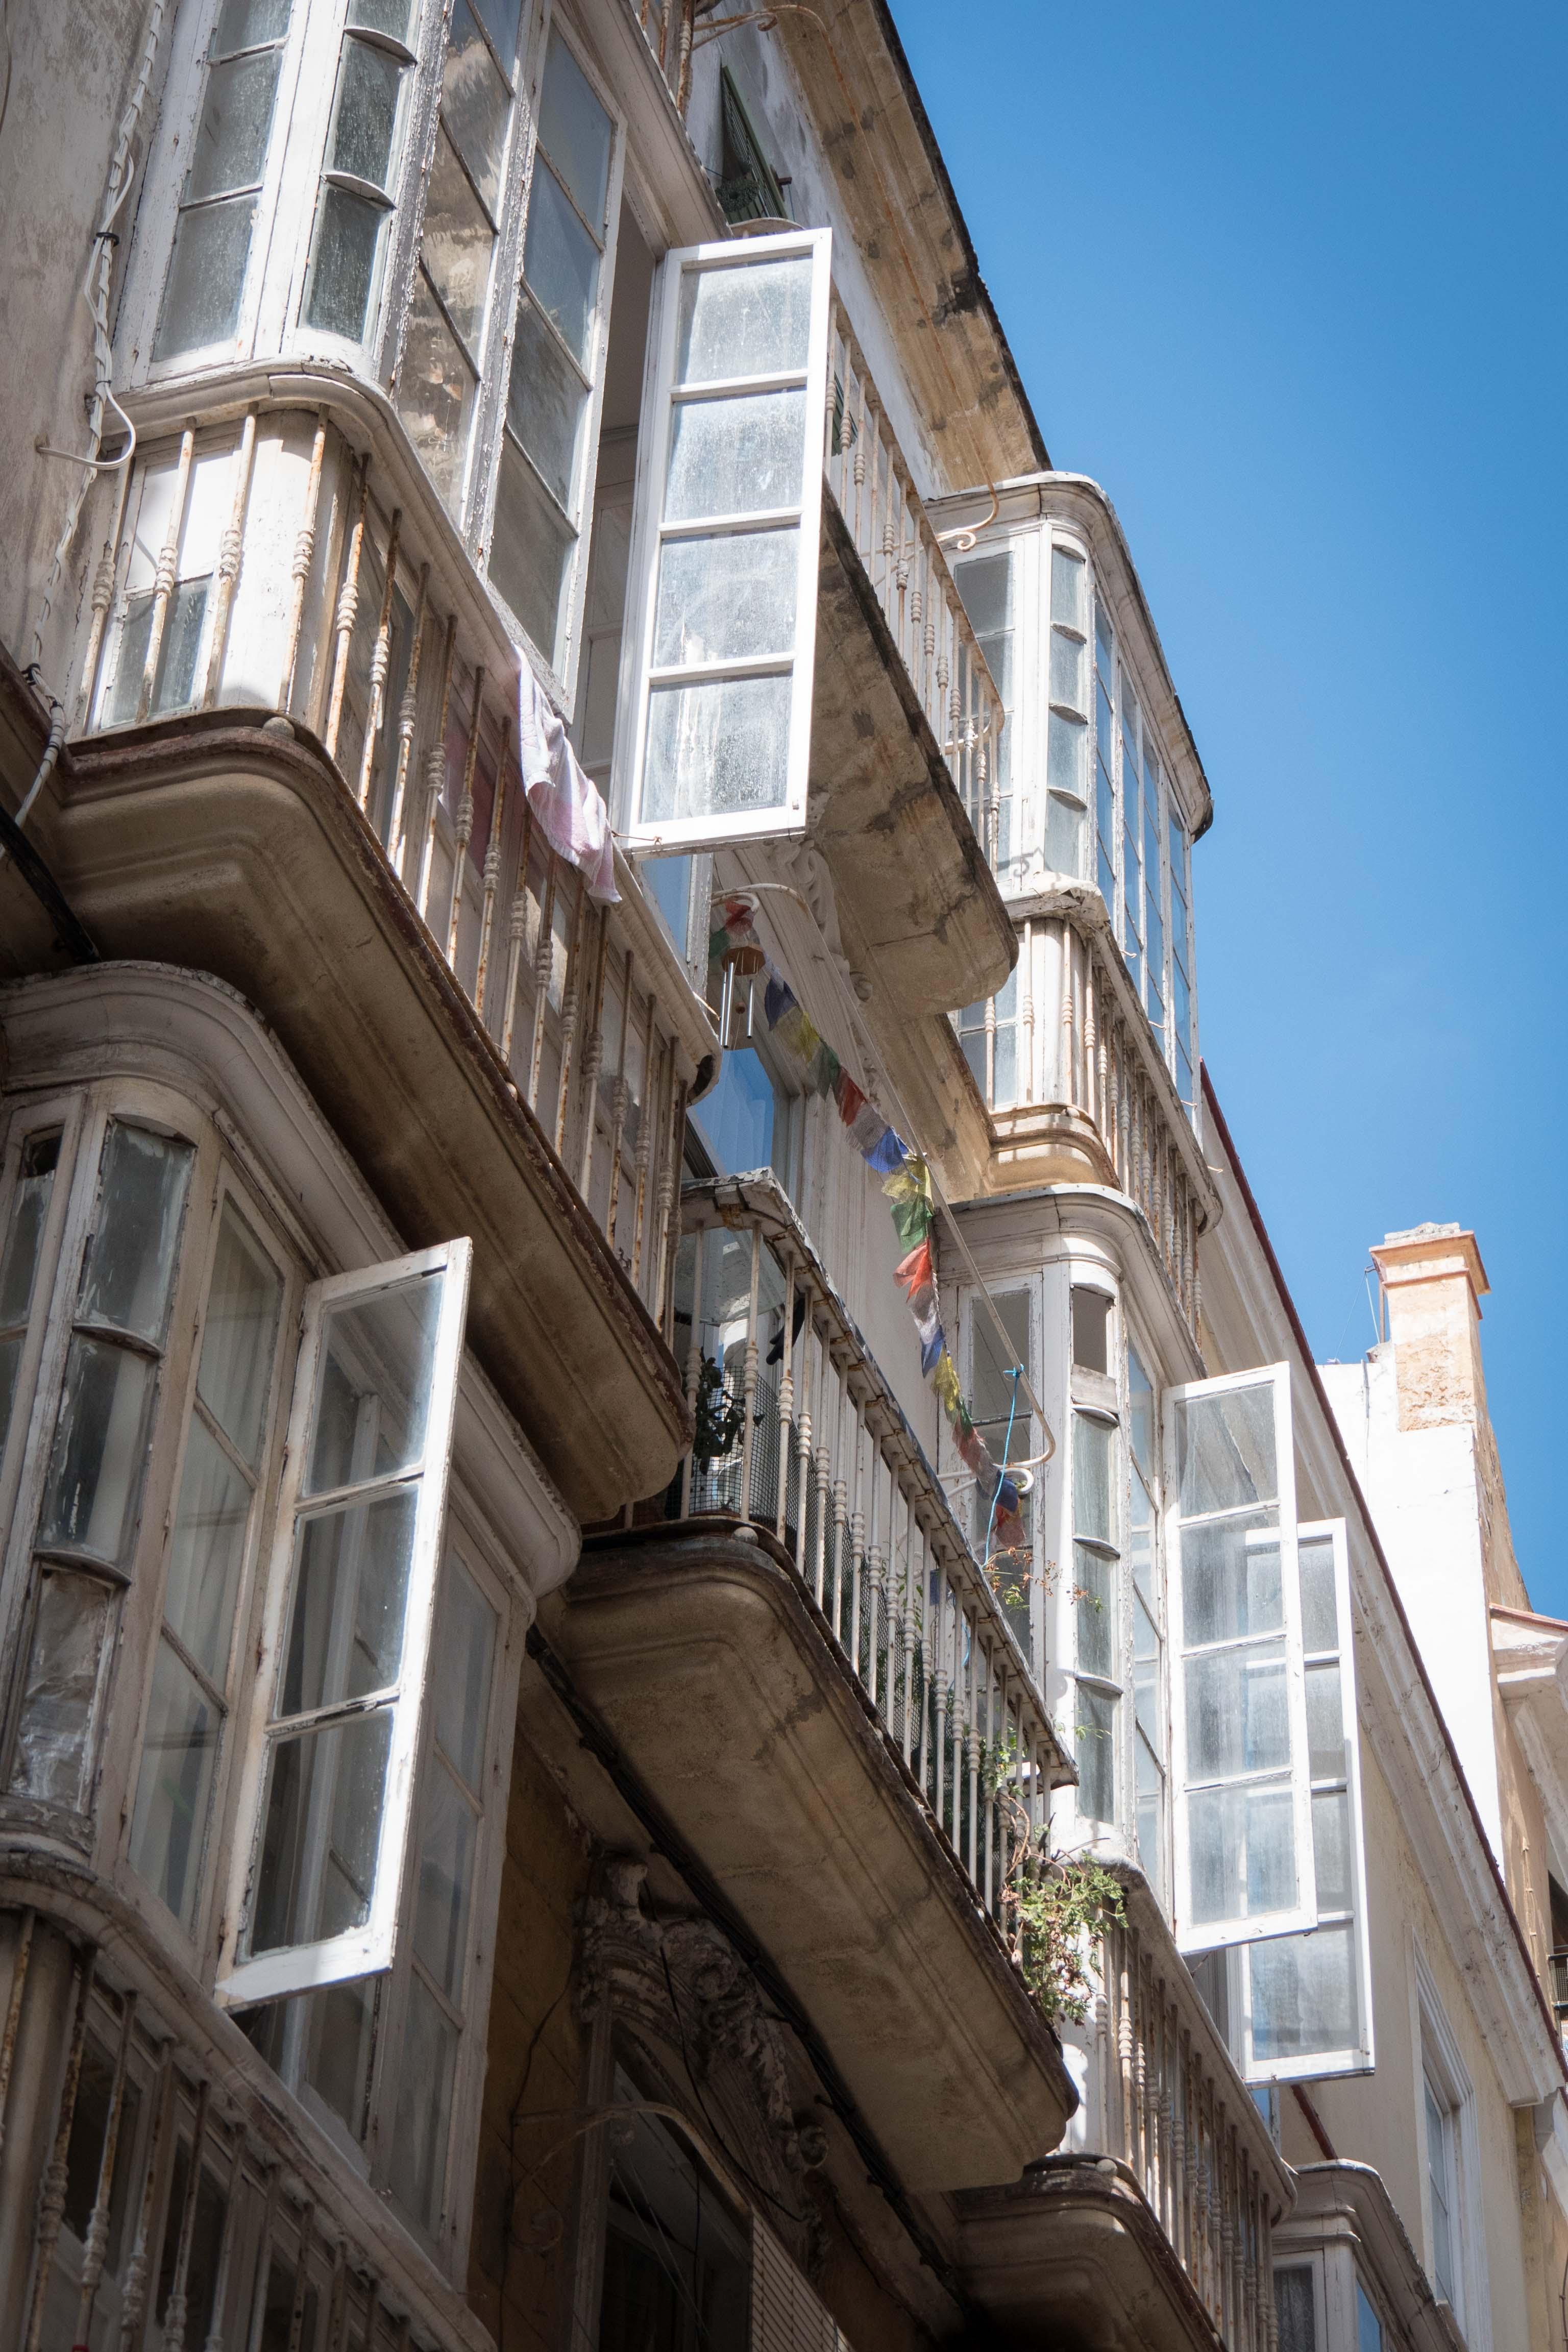 Windows and Prayer-flags,Cadiz